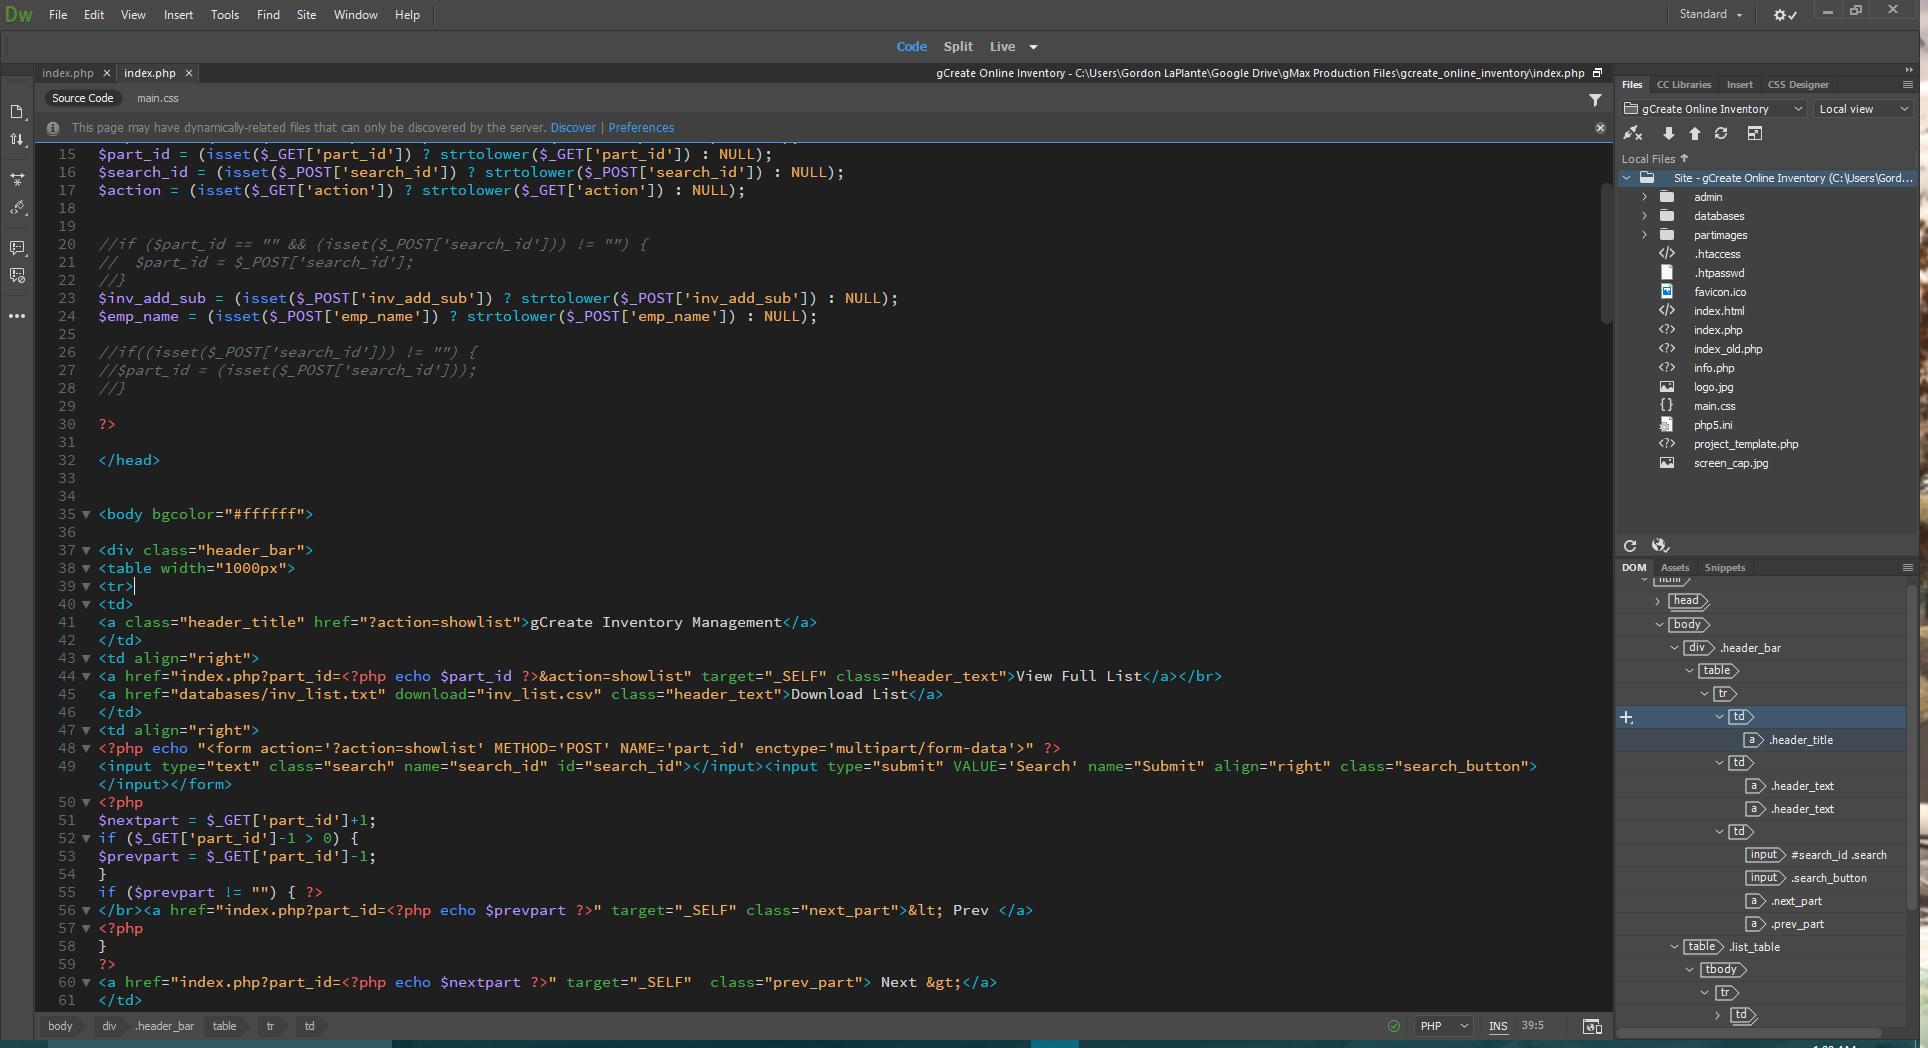 gcreate_inv_code